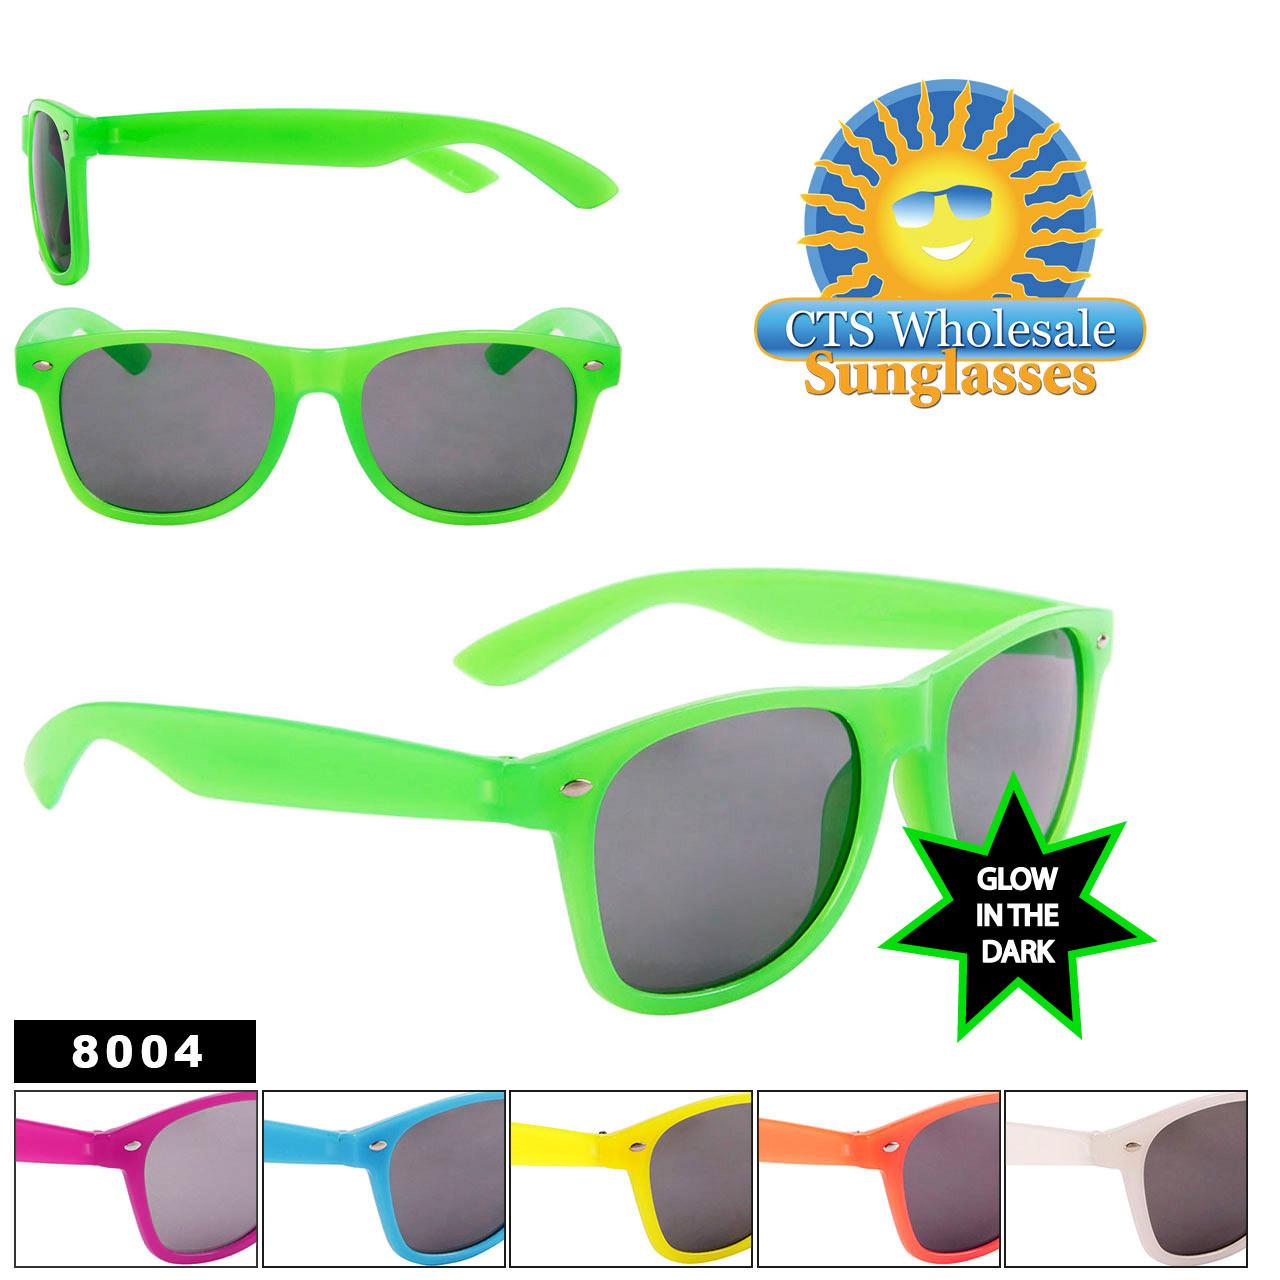 Wholesale Glow In The Dark Sunglasses - Bulk California Classics - Style # 8004